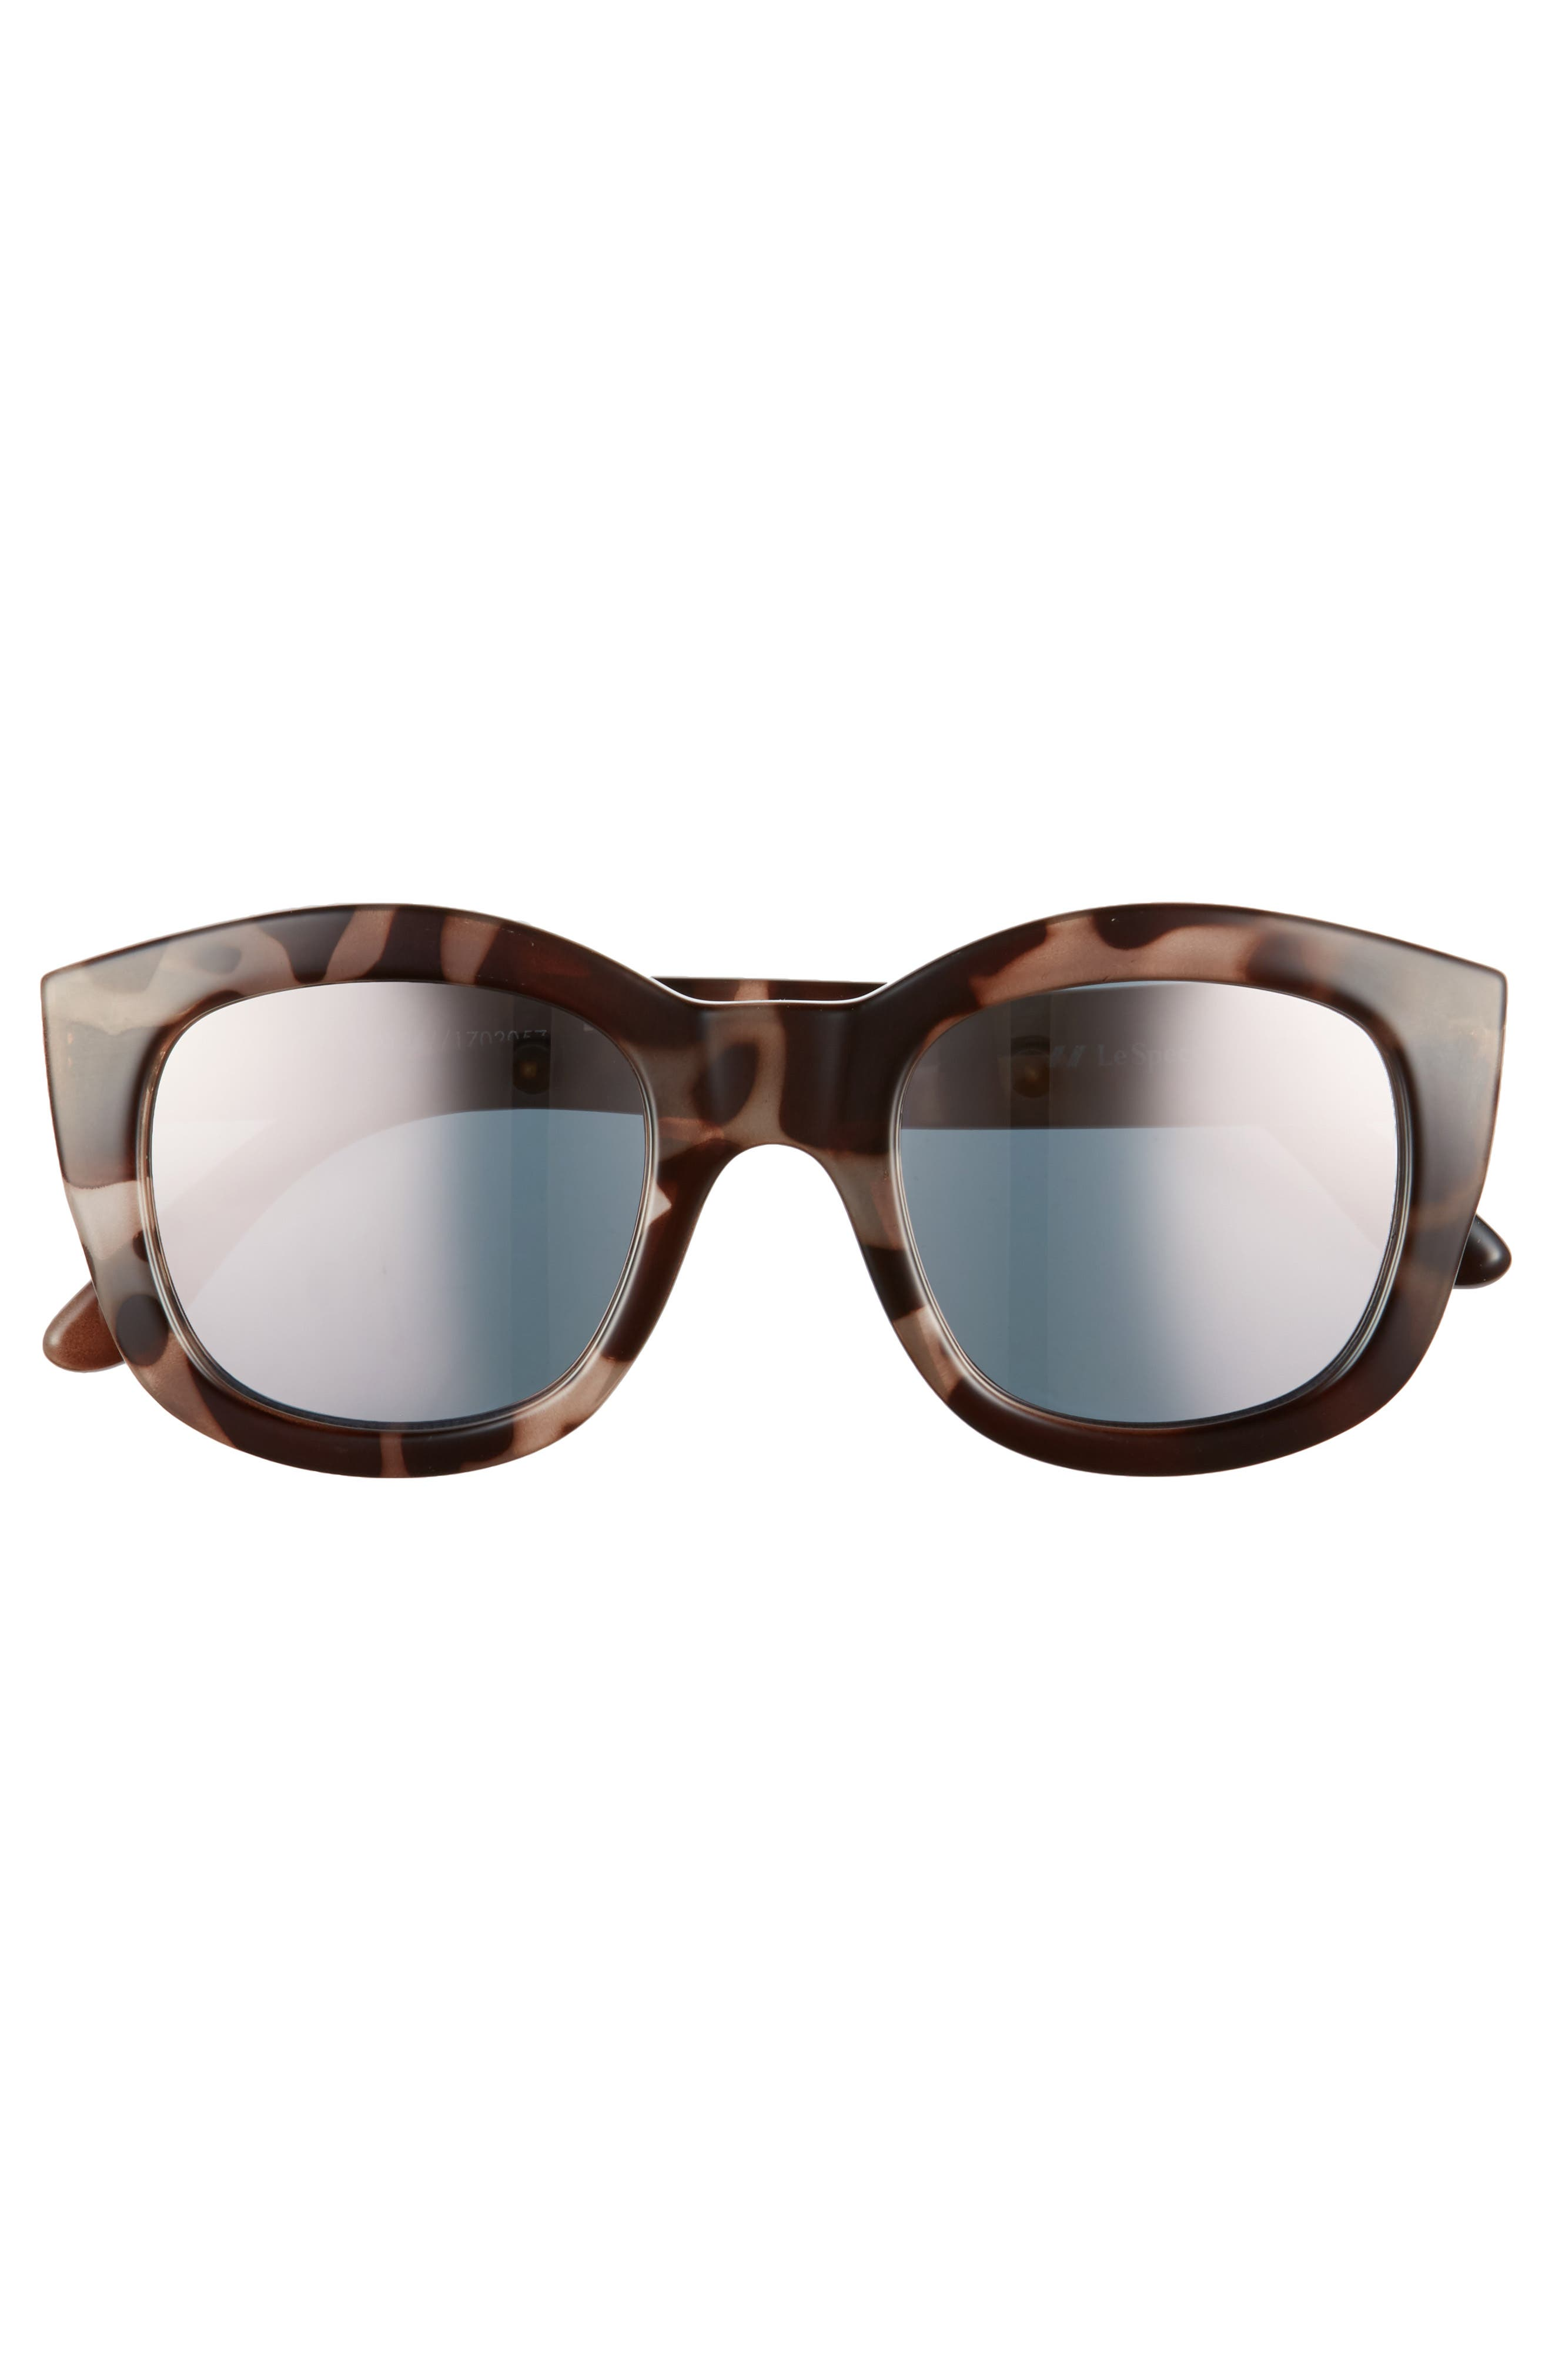 Runaways 48mm Rectangular Sunglasses,                             Alternate thumbnail 3, color,                             200